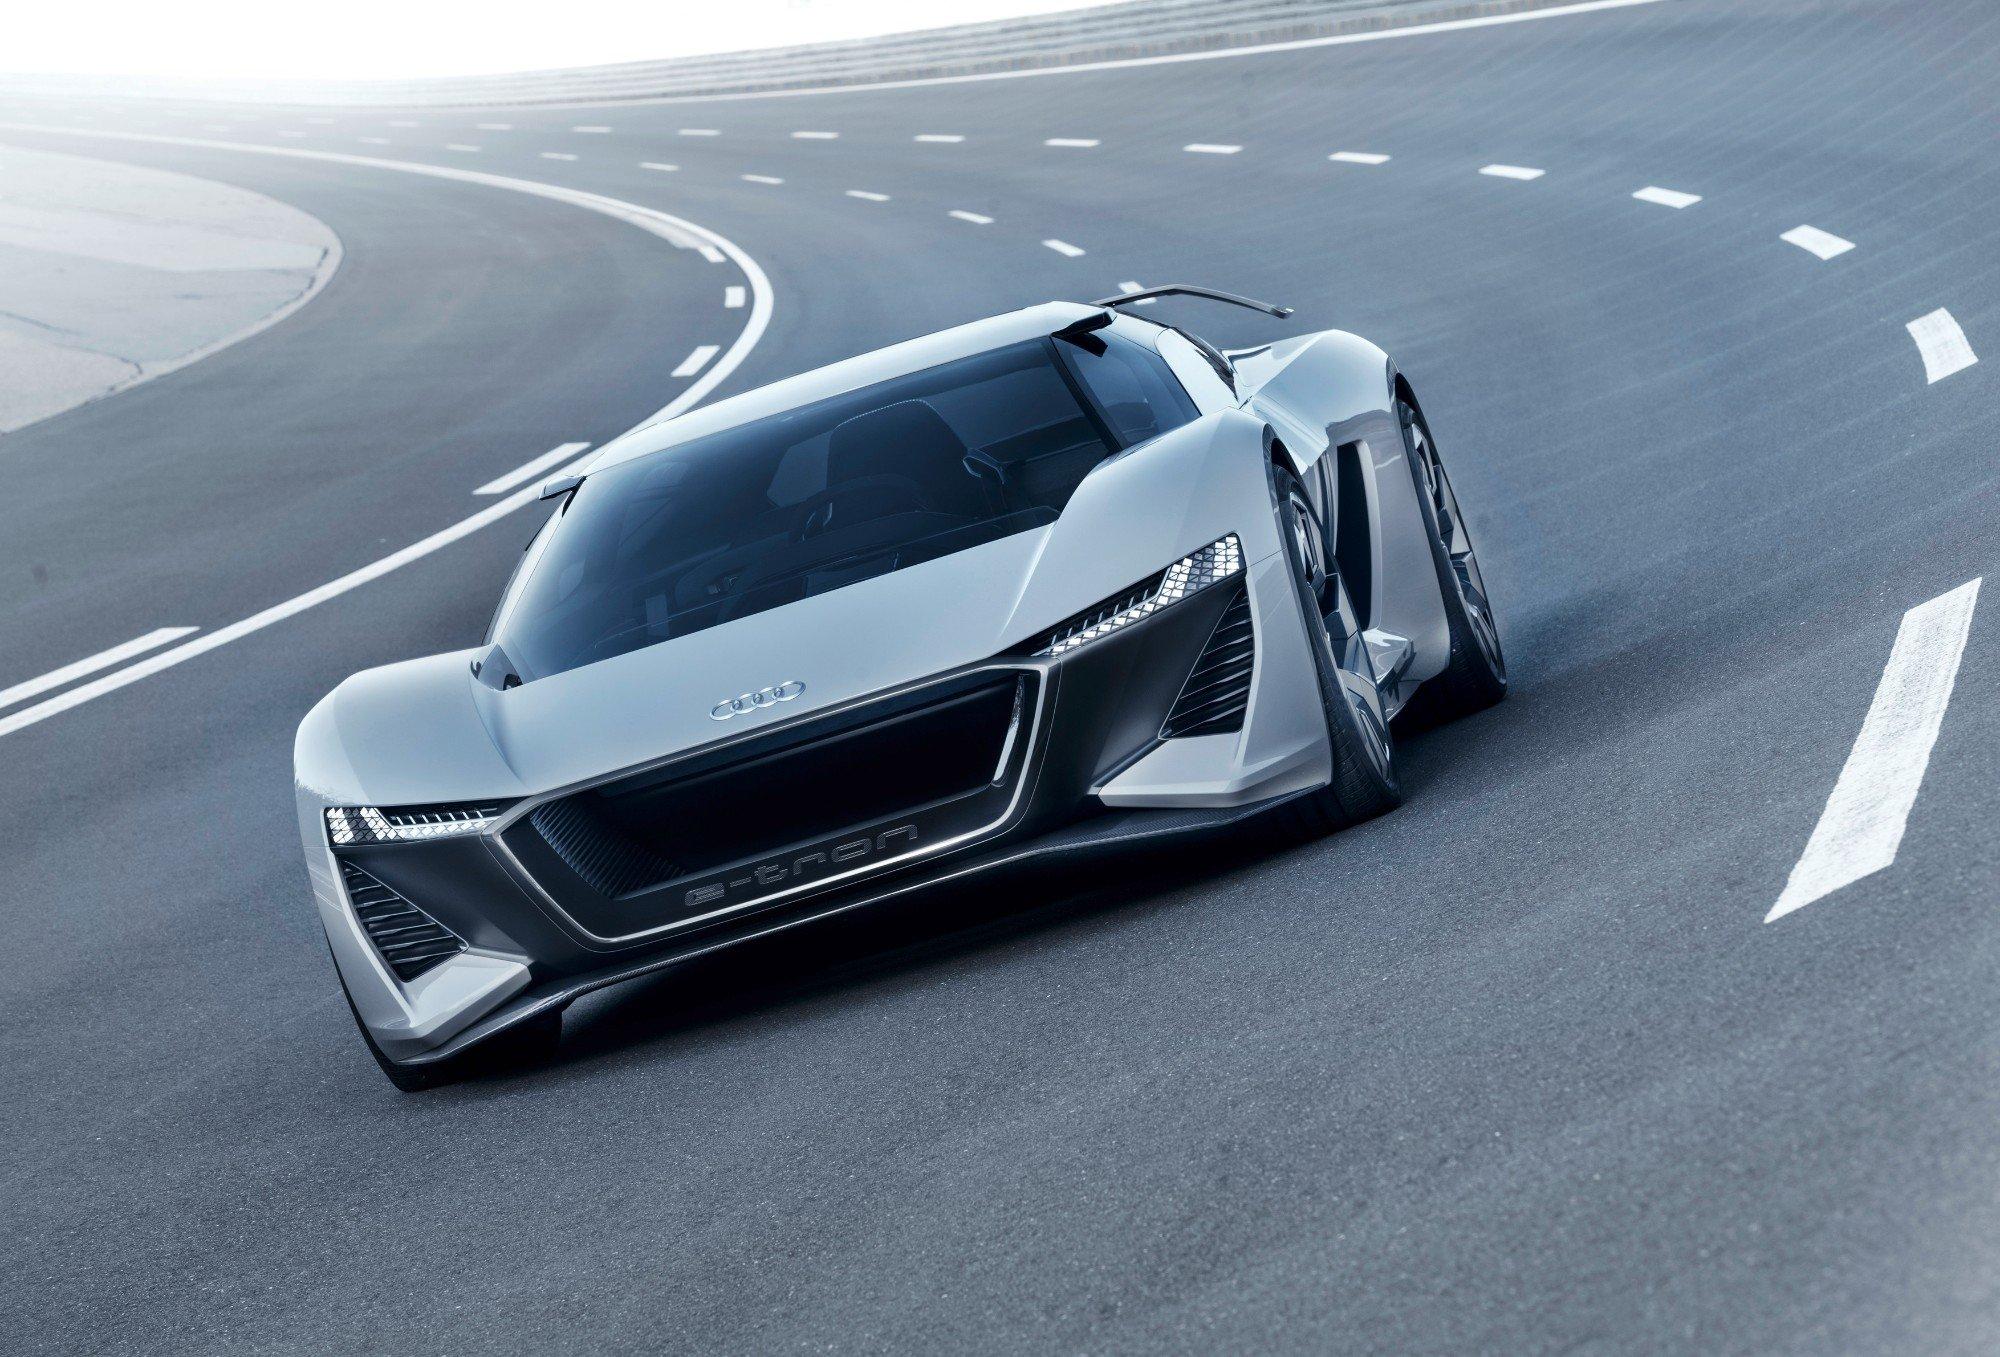 Audi представит в Лос-Анджелесе электрический купе-седан Audi e-tron GT